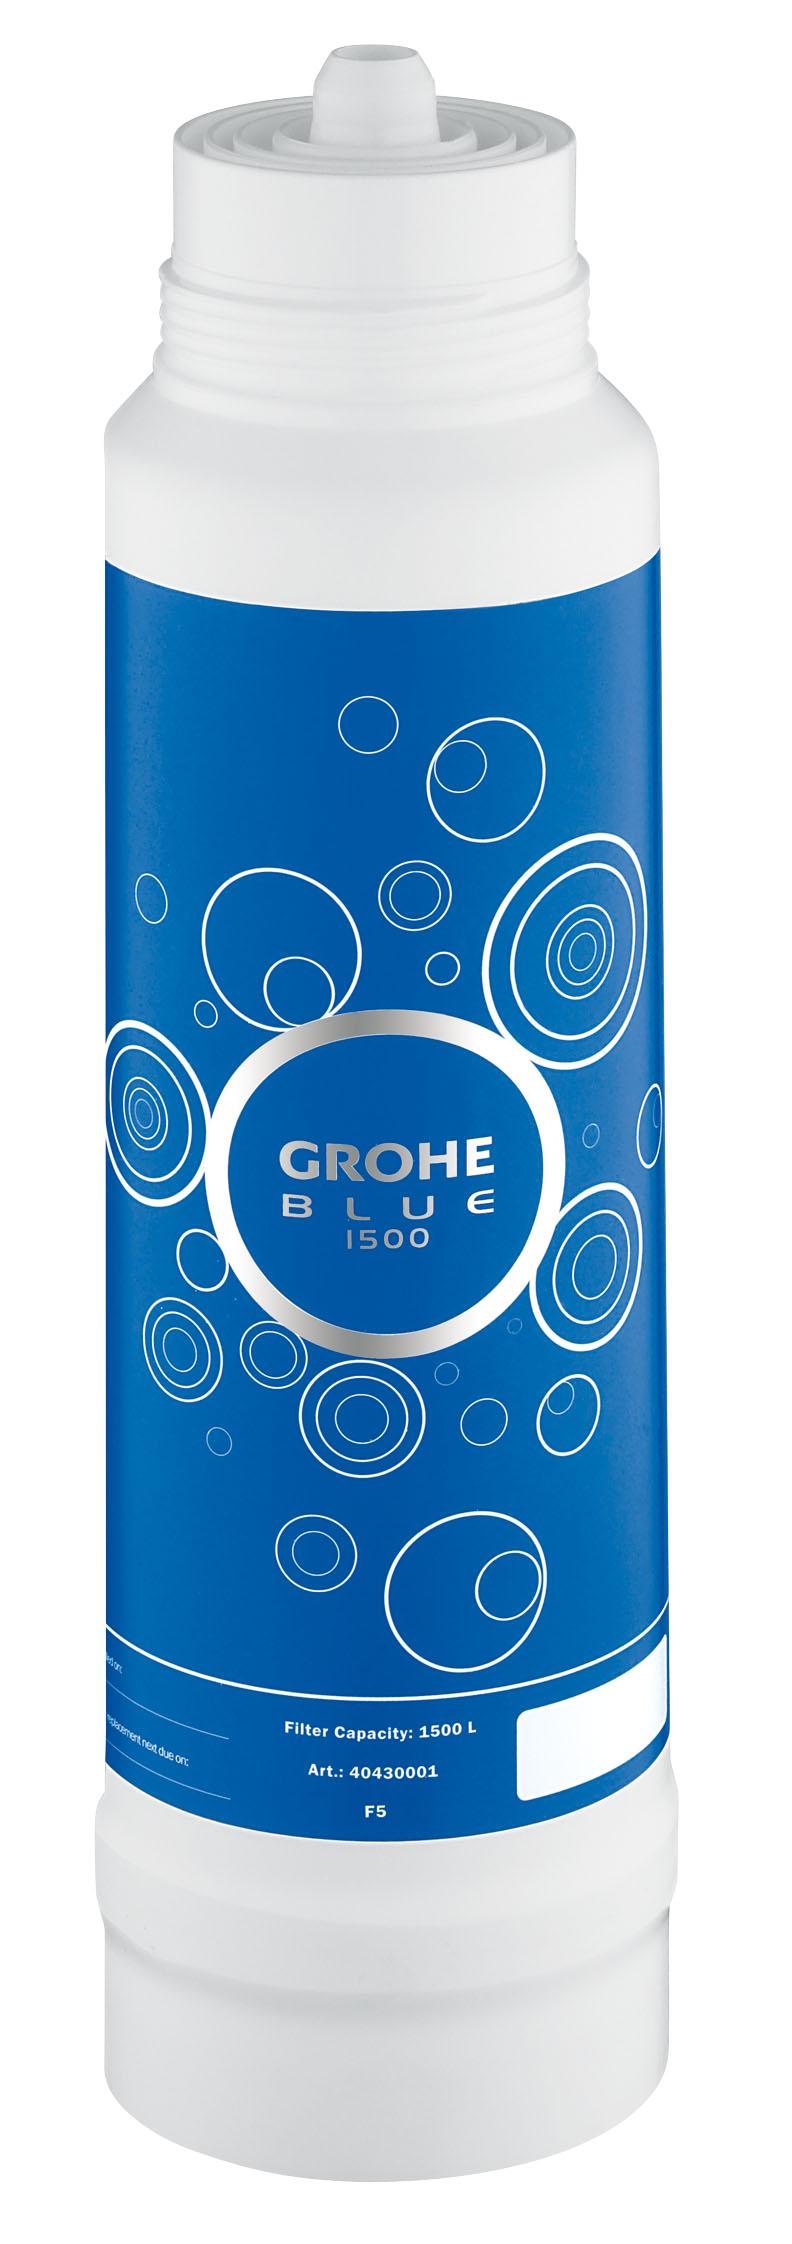 "������ ������� ��� ������ ������ Grohe ""Blue"", 1500 �. 40430001"